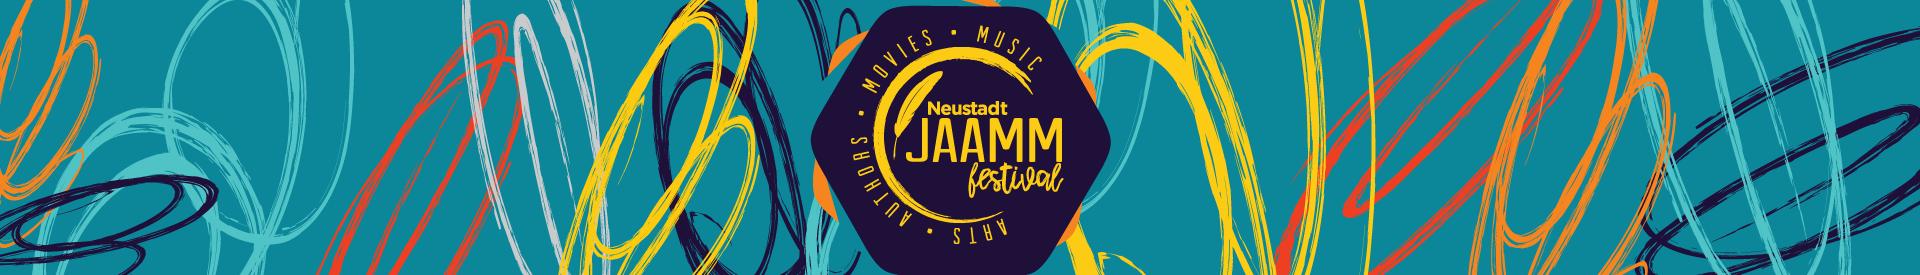 Neustadt JAAMM Festival (Jewish Arts, Authors, Movies and Music)